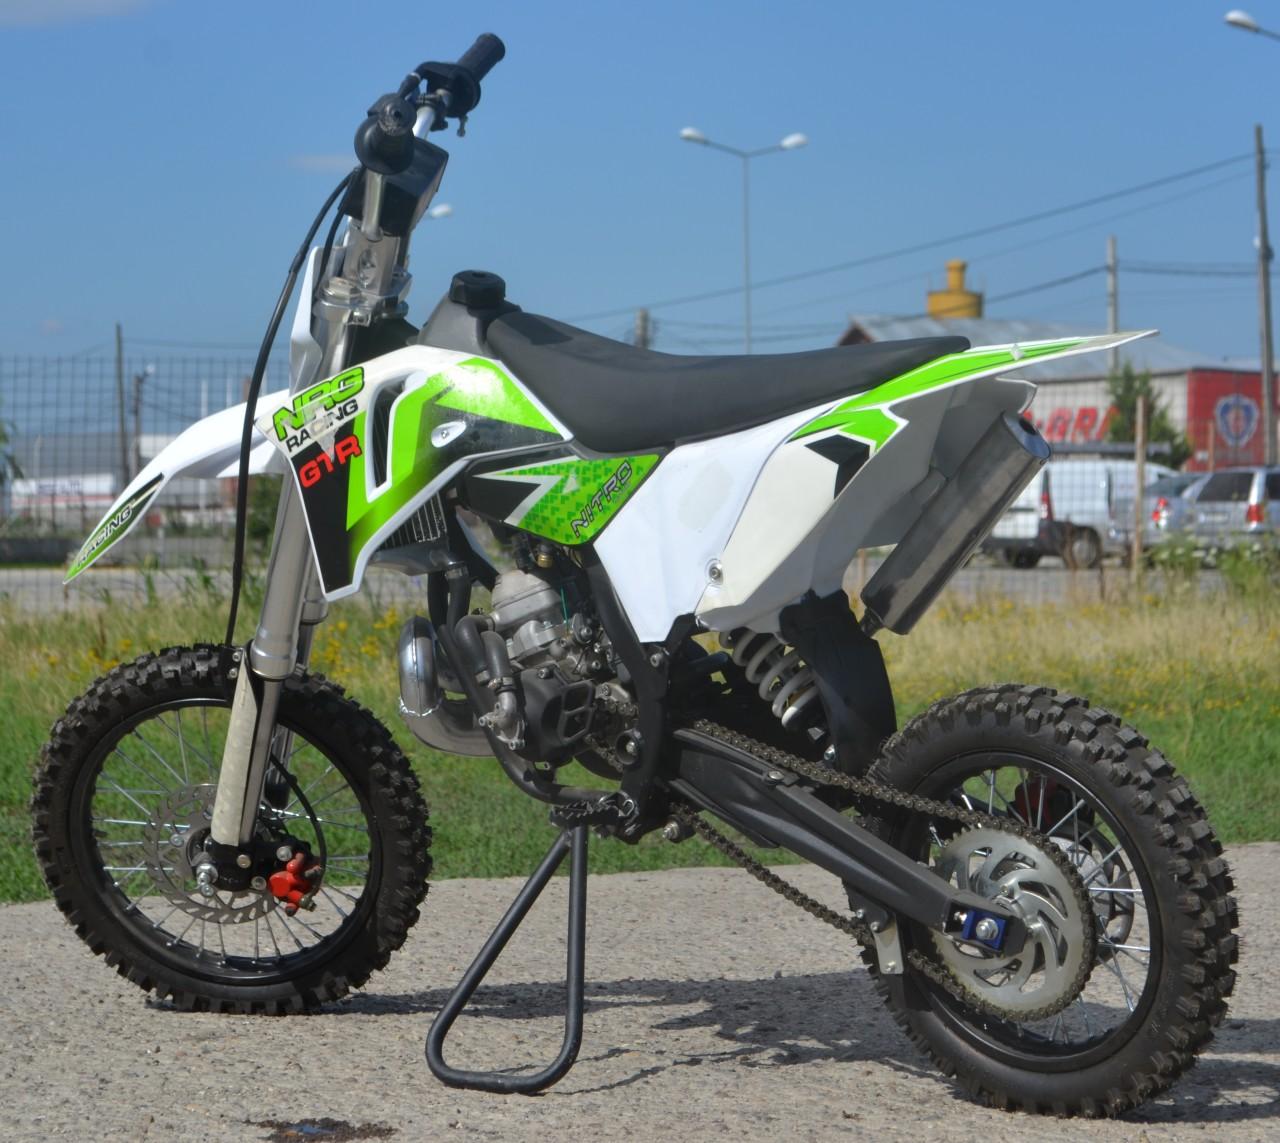 Motocicleta Nitro DirtBikeNRG65 14/12 GTR